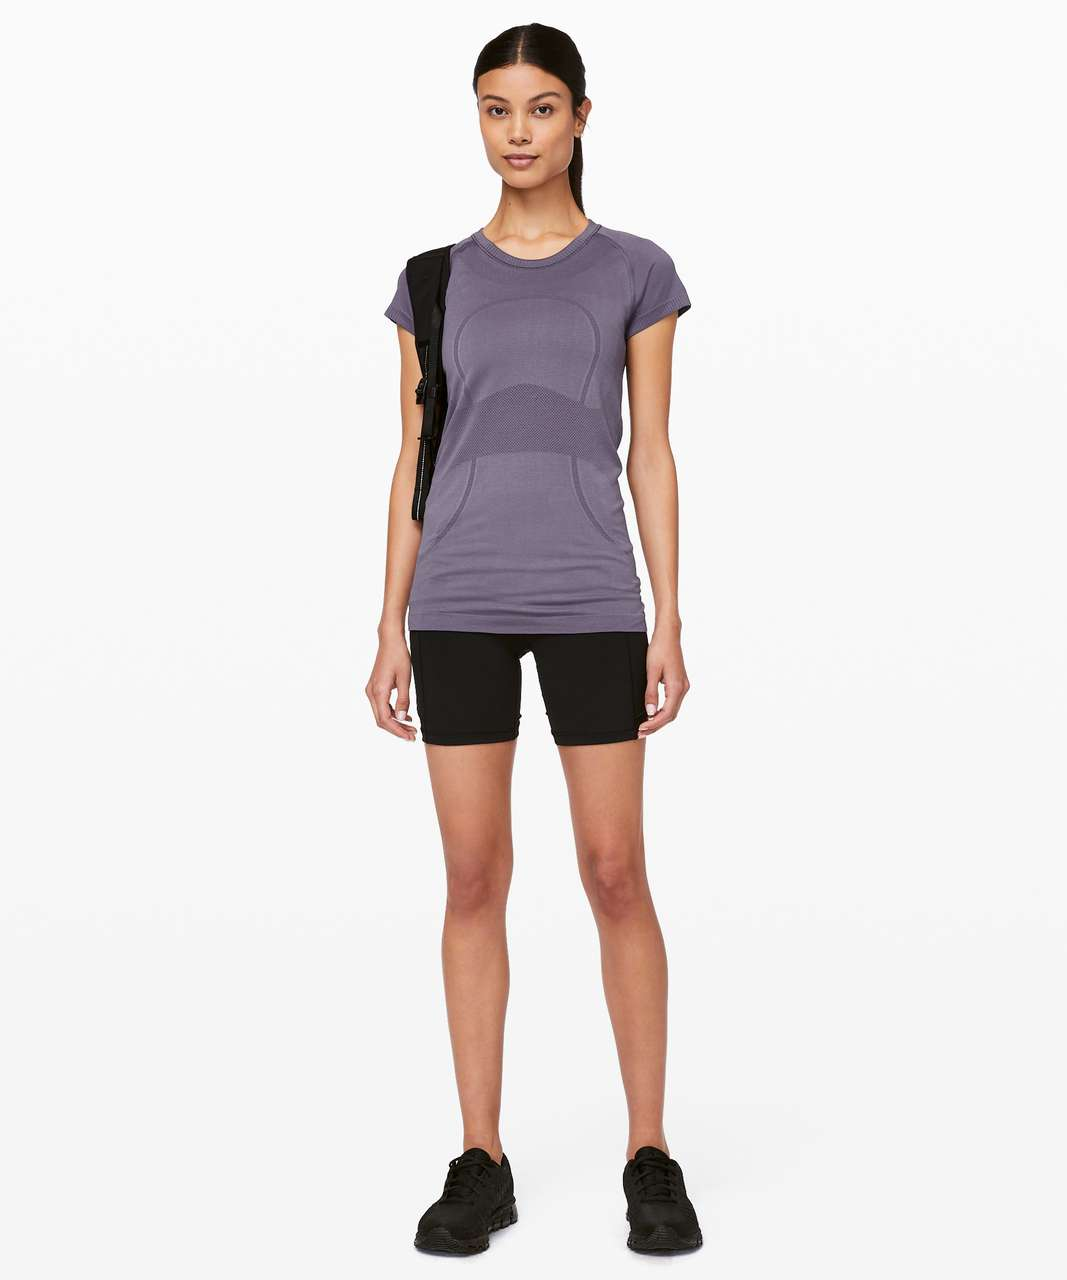 Lululemon Swiftly Tech Short Sleeve Crew - Grape Mist / Grape Mist